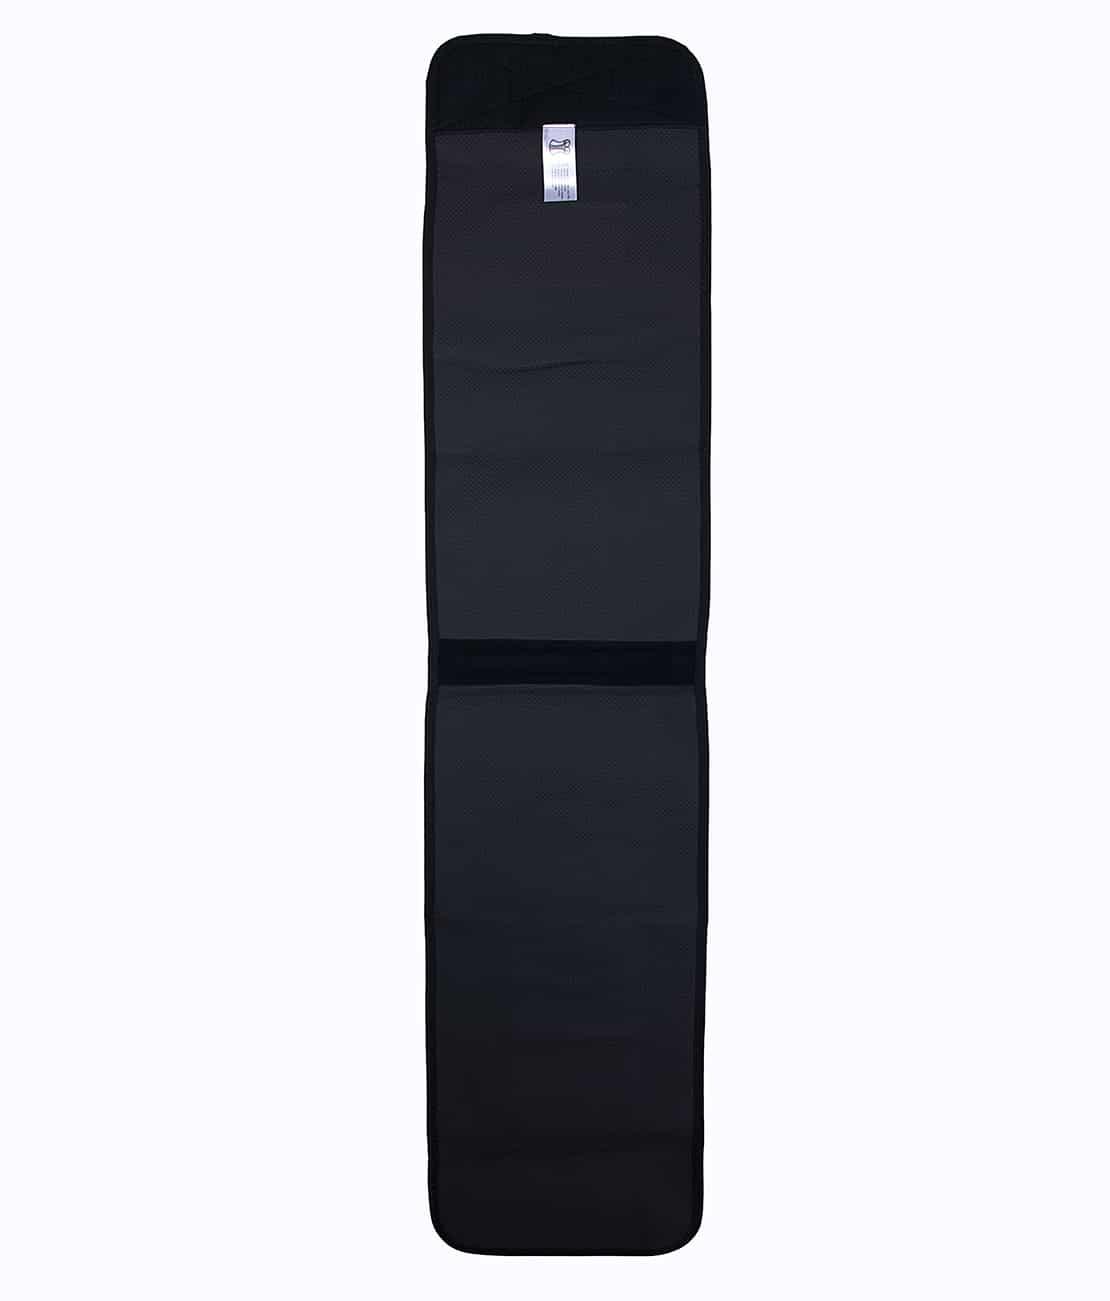 Ceinture de Sudation Noire Packshot Open in